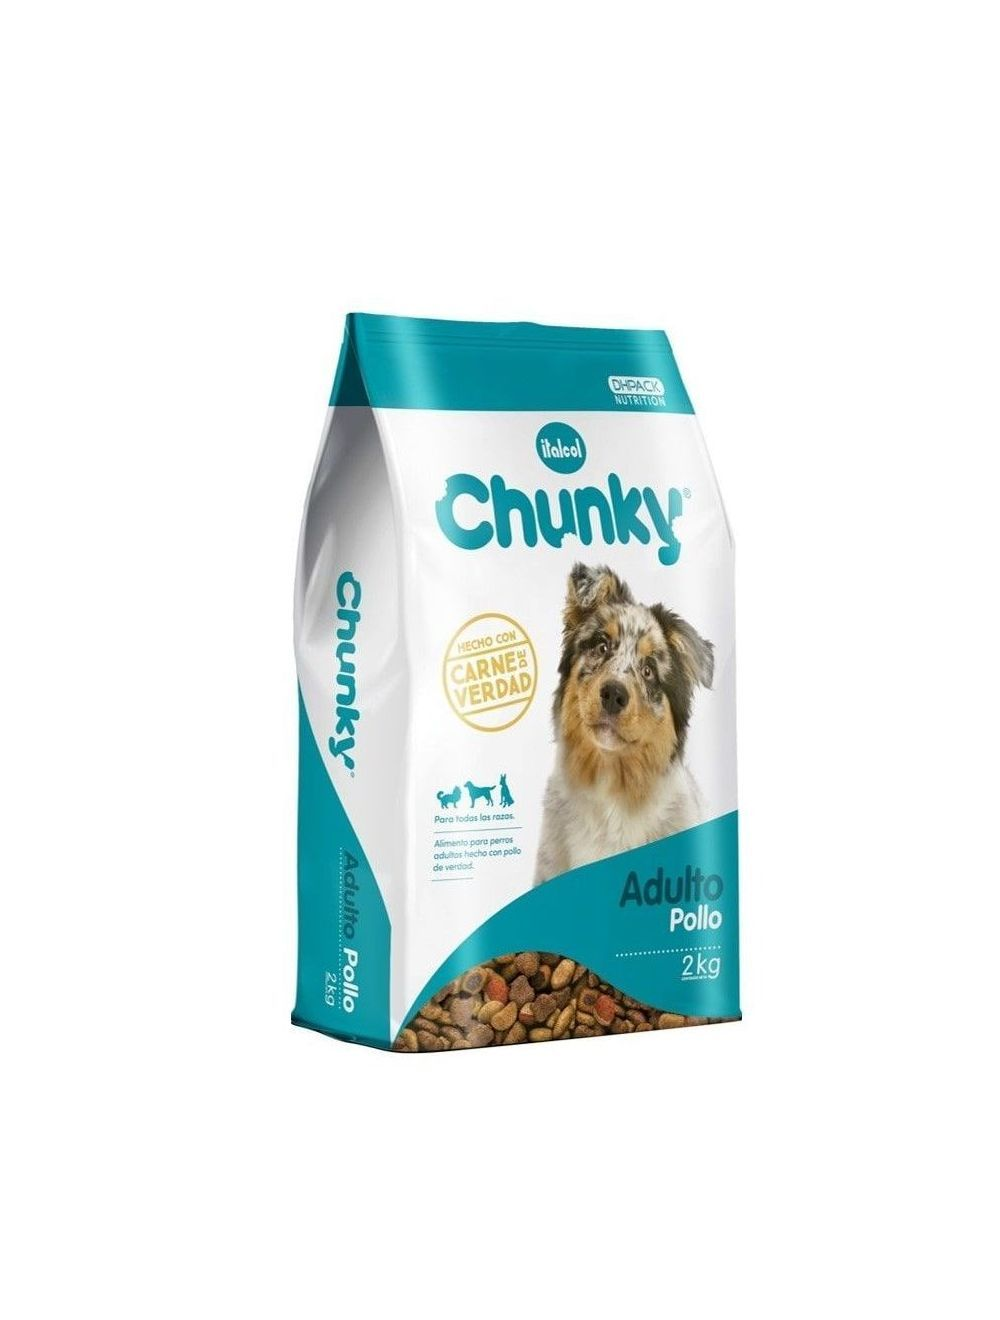 Comida para perro Chunky Adulto pollo-ciudaddemascotas.com